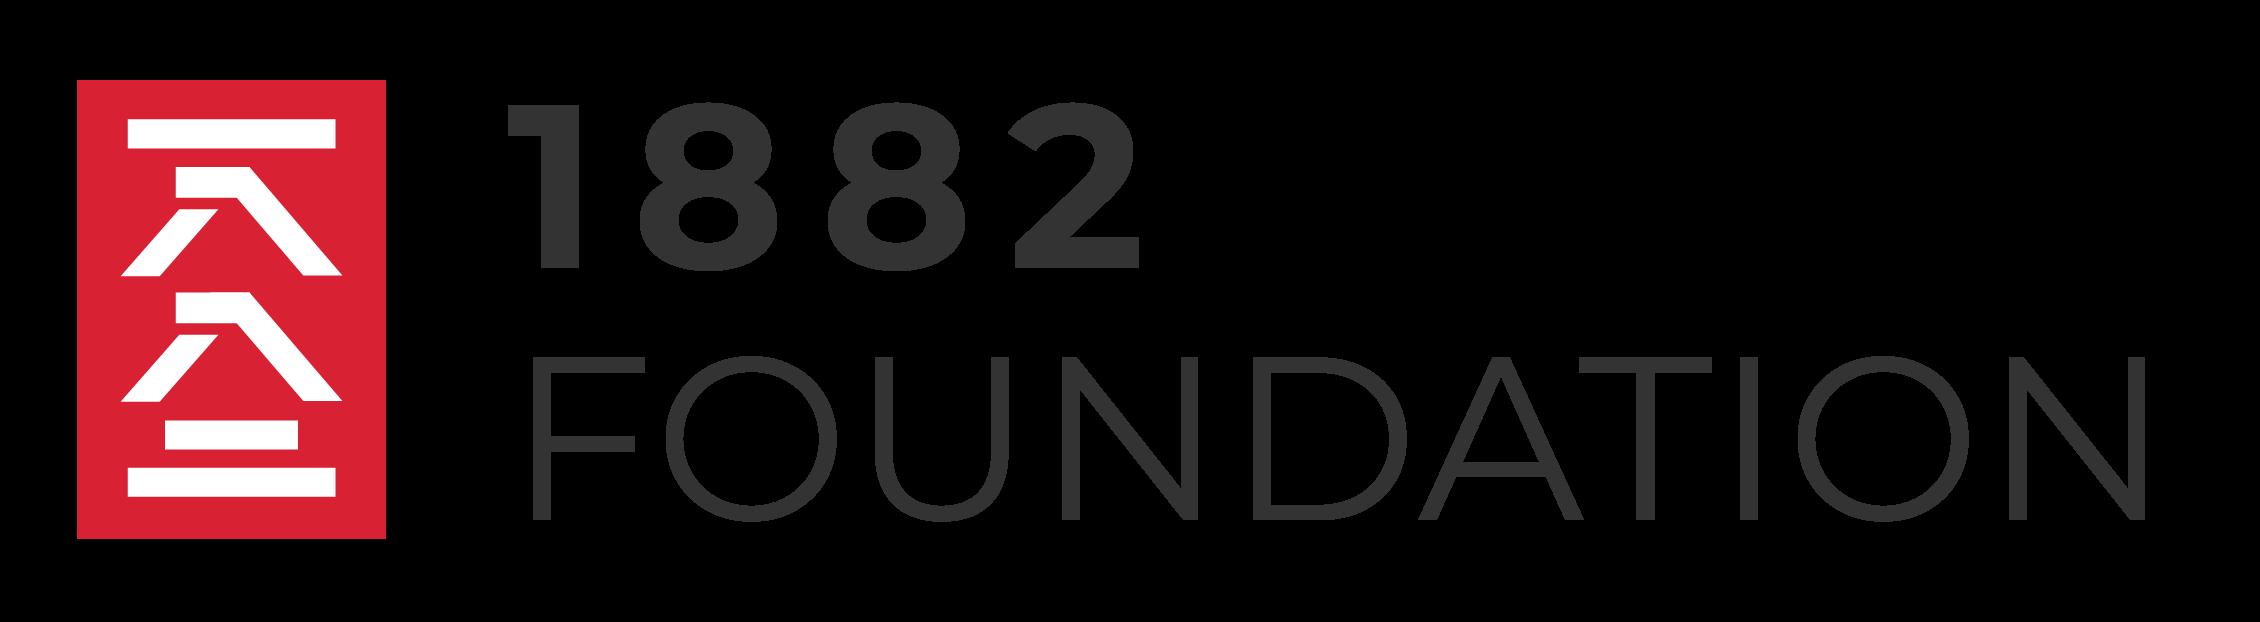 1882 Foundation